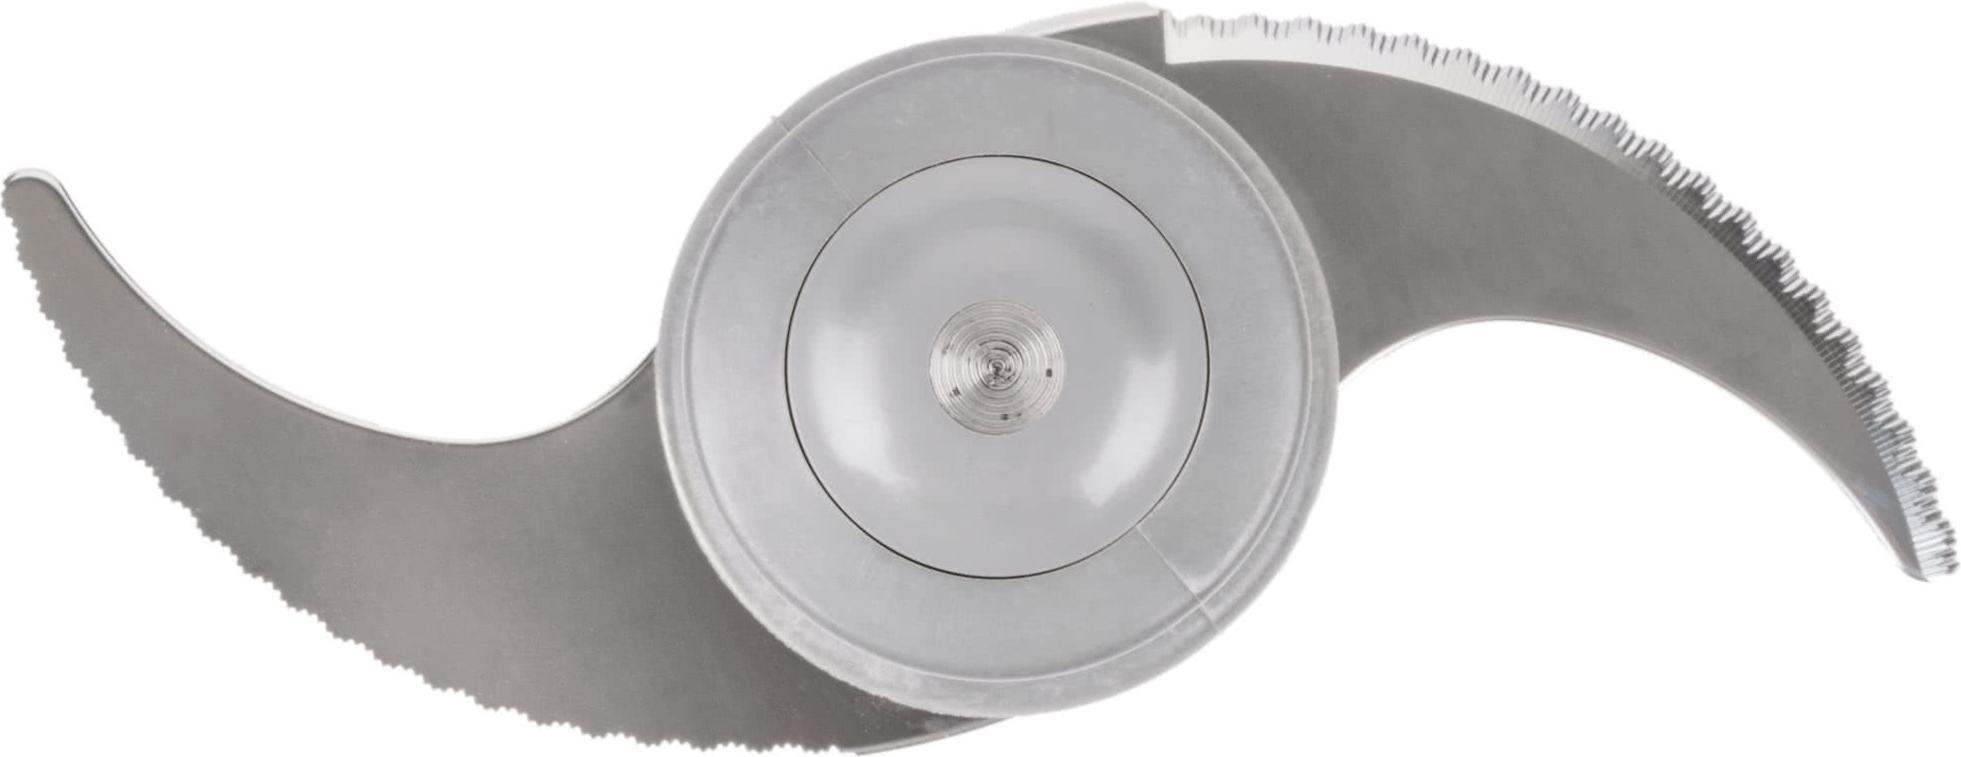 Зазубренный нож Robot Coupe27447 - 2